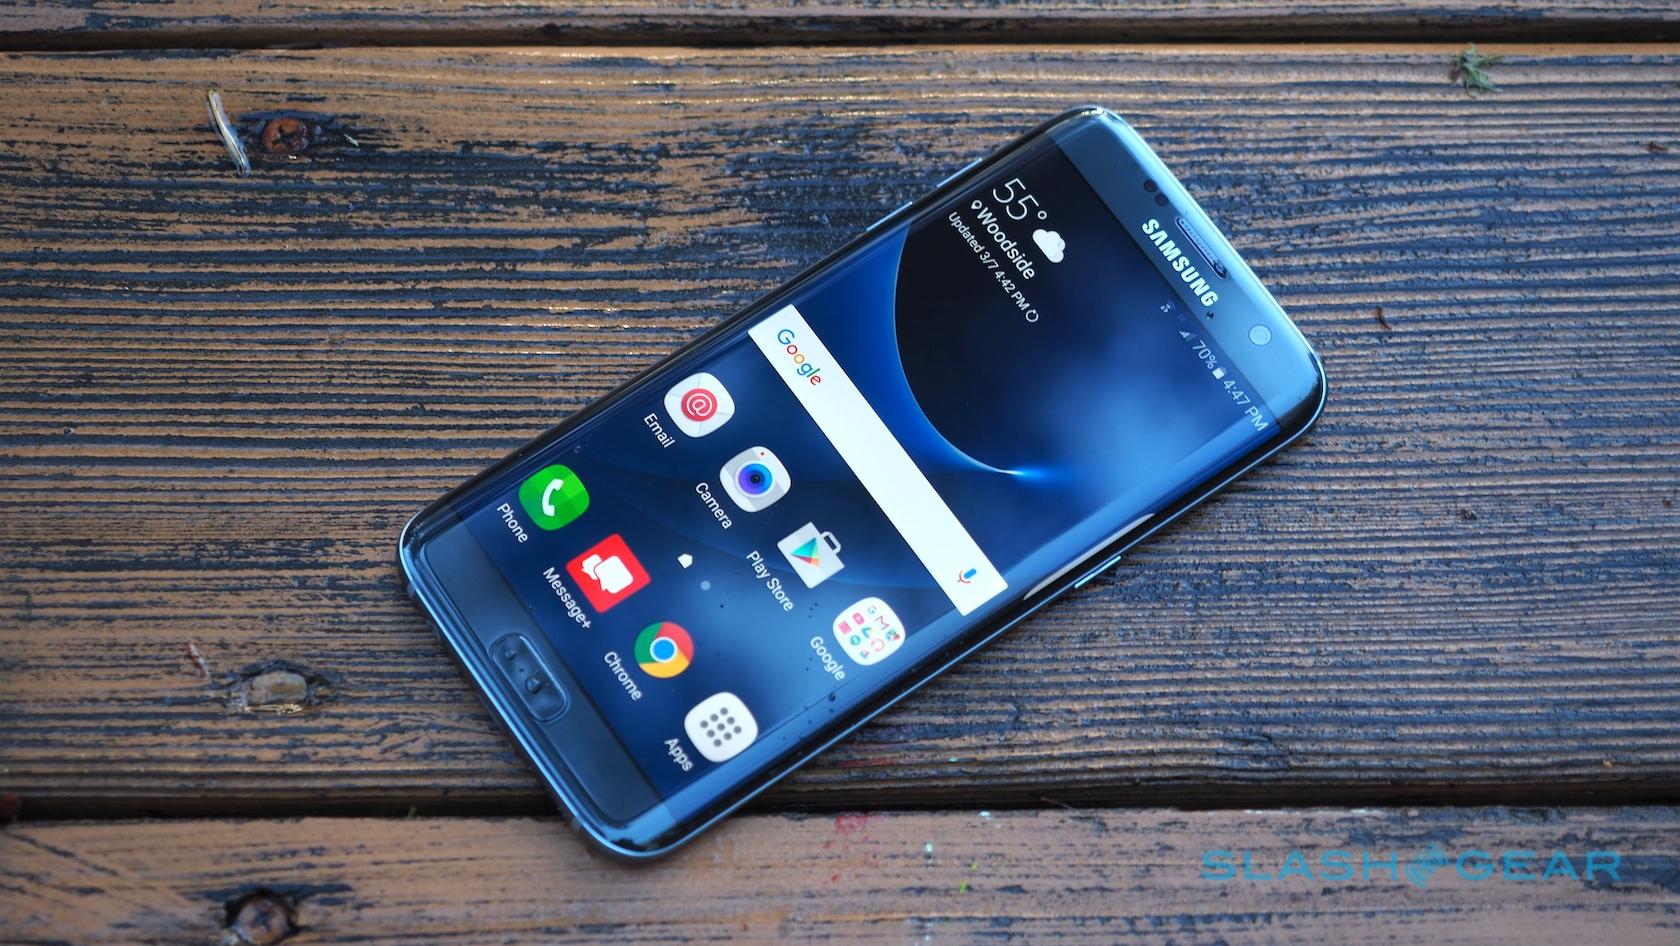 Samsung Galaxy S7 Edge - Sfaturi și trucuri